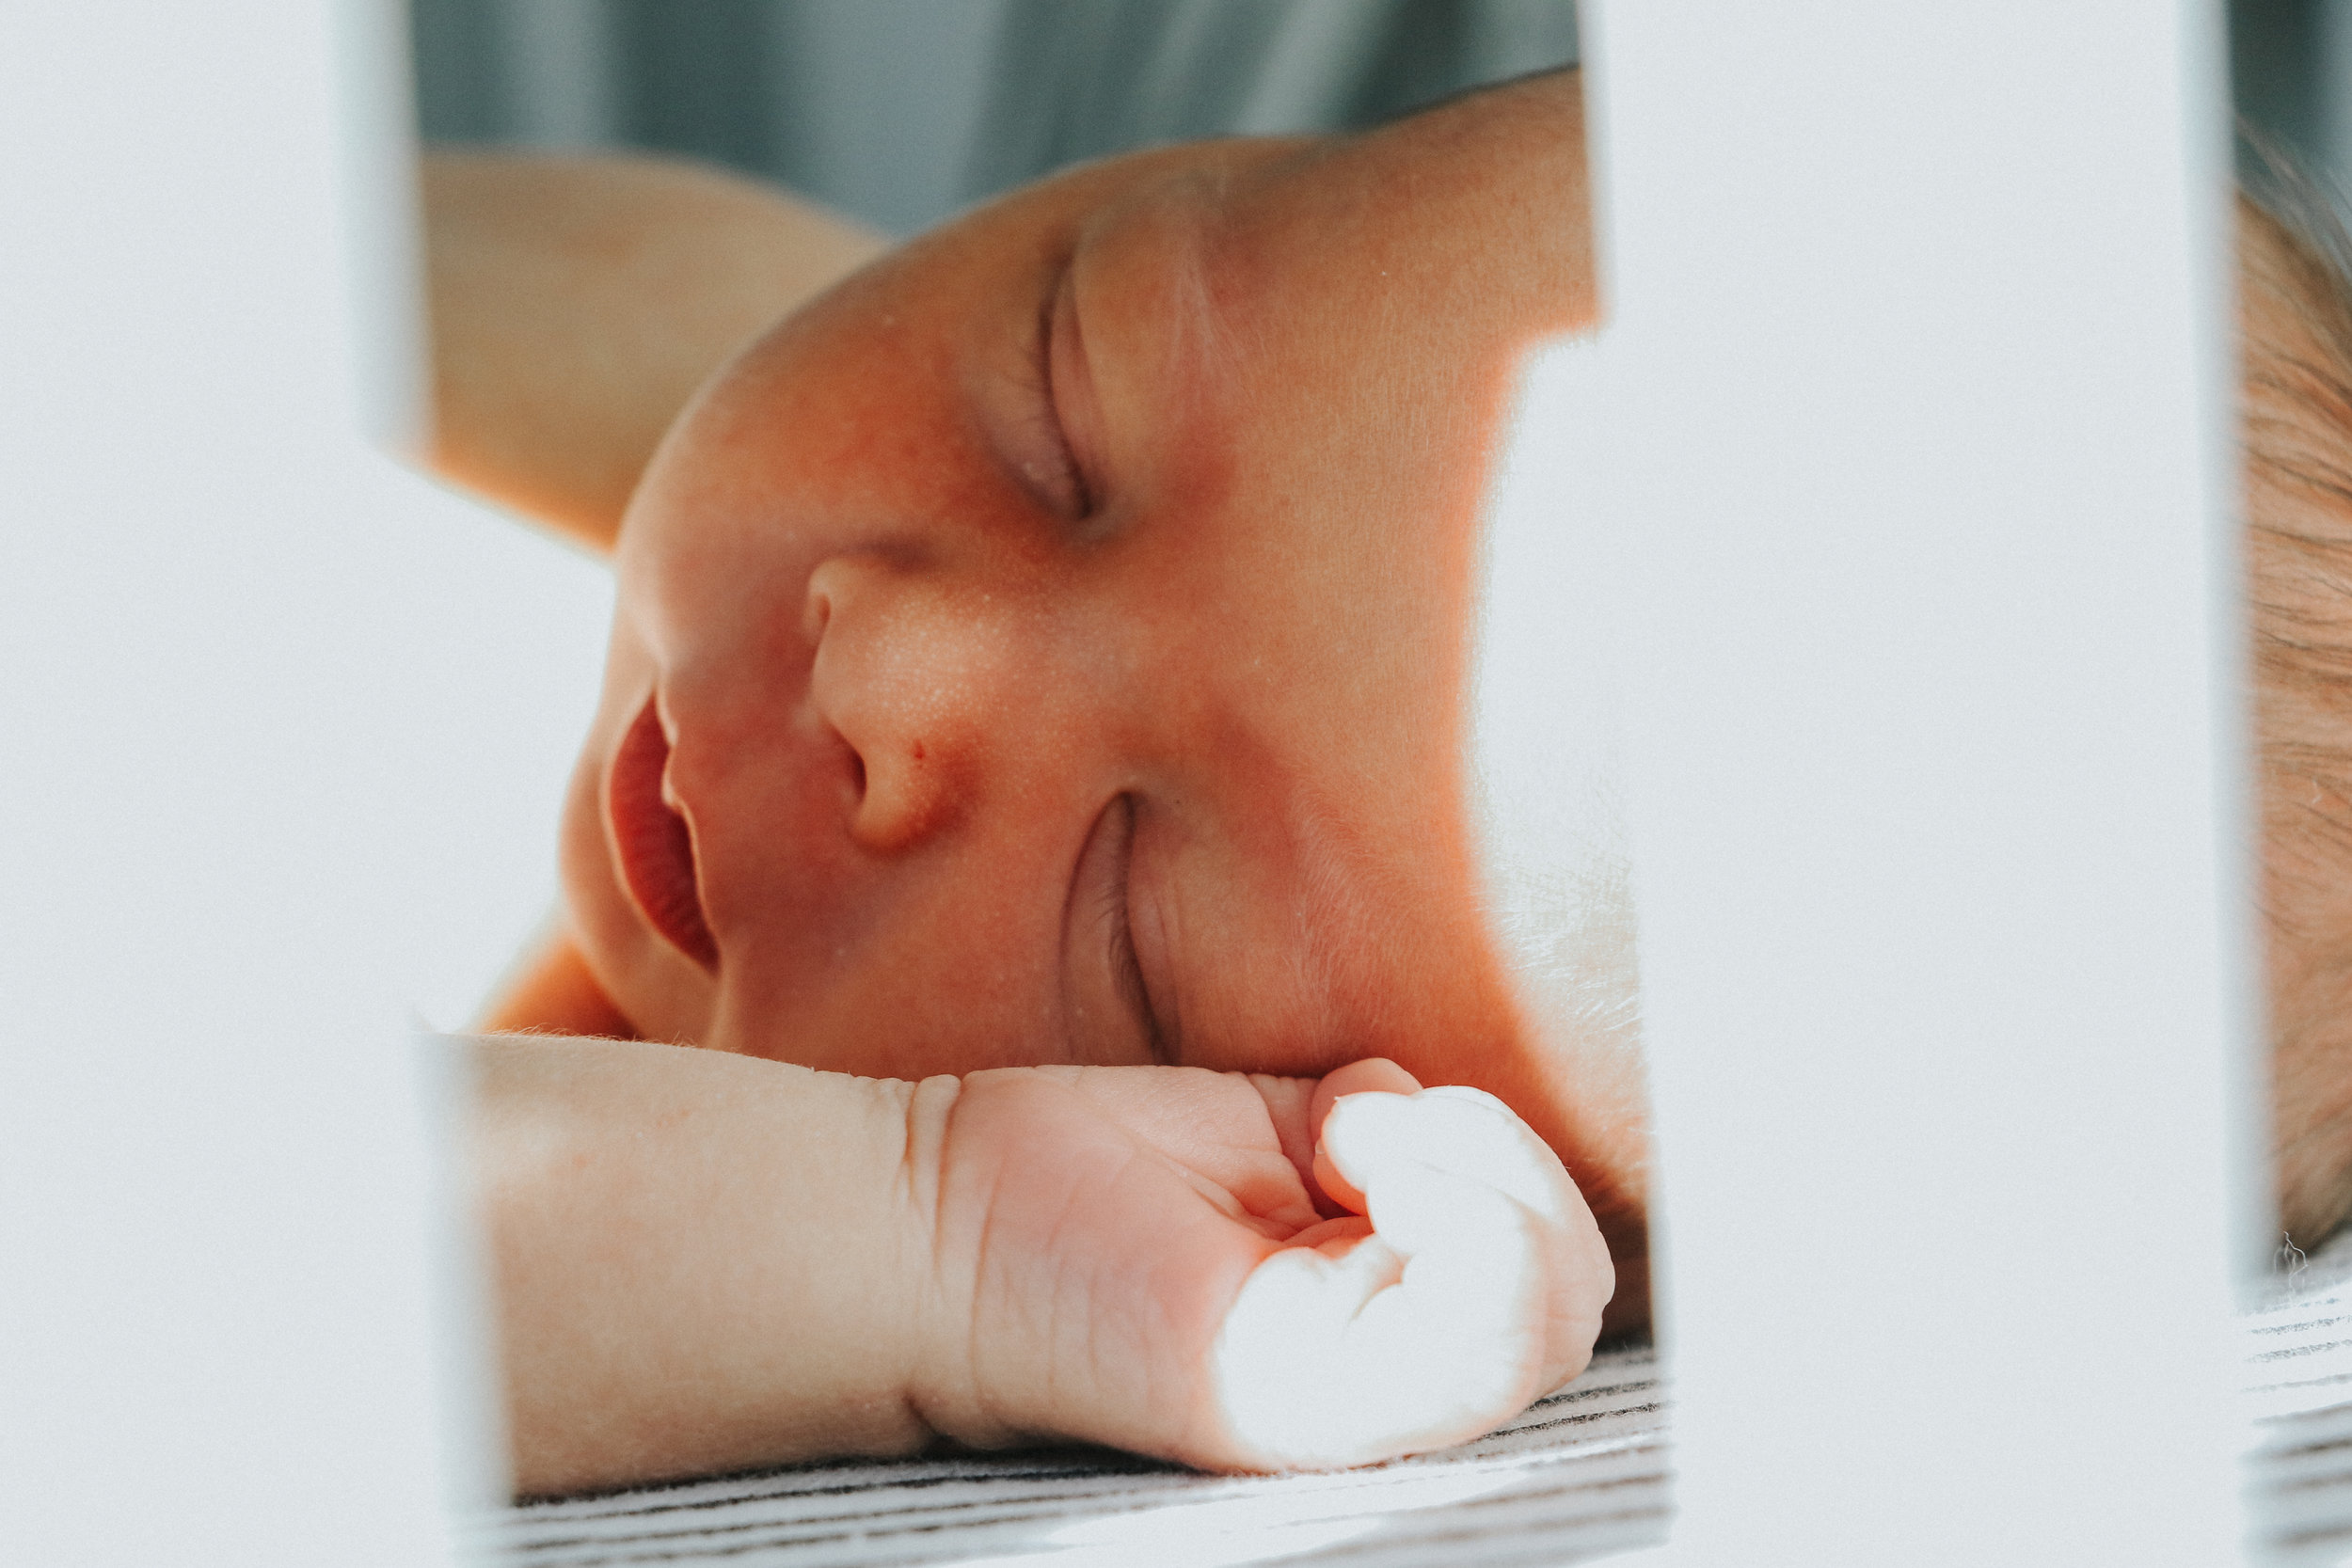 Baby Oliver_077.jpg